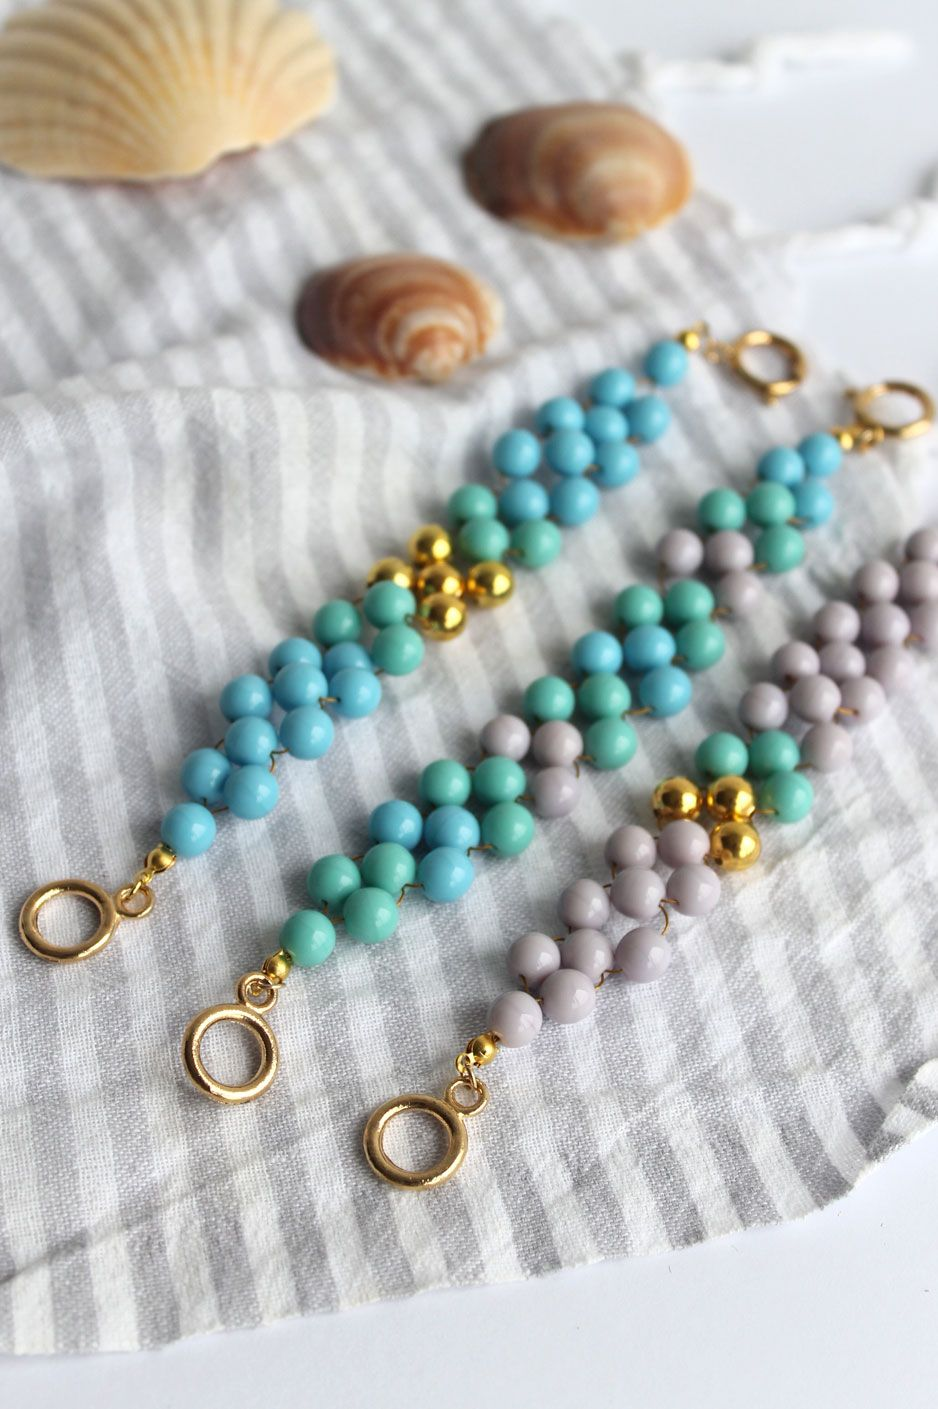 DIY - Woven Bead Bracelet | Beaded bracelets tutorial, Beads and ...